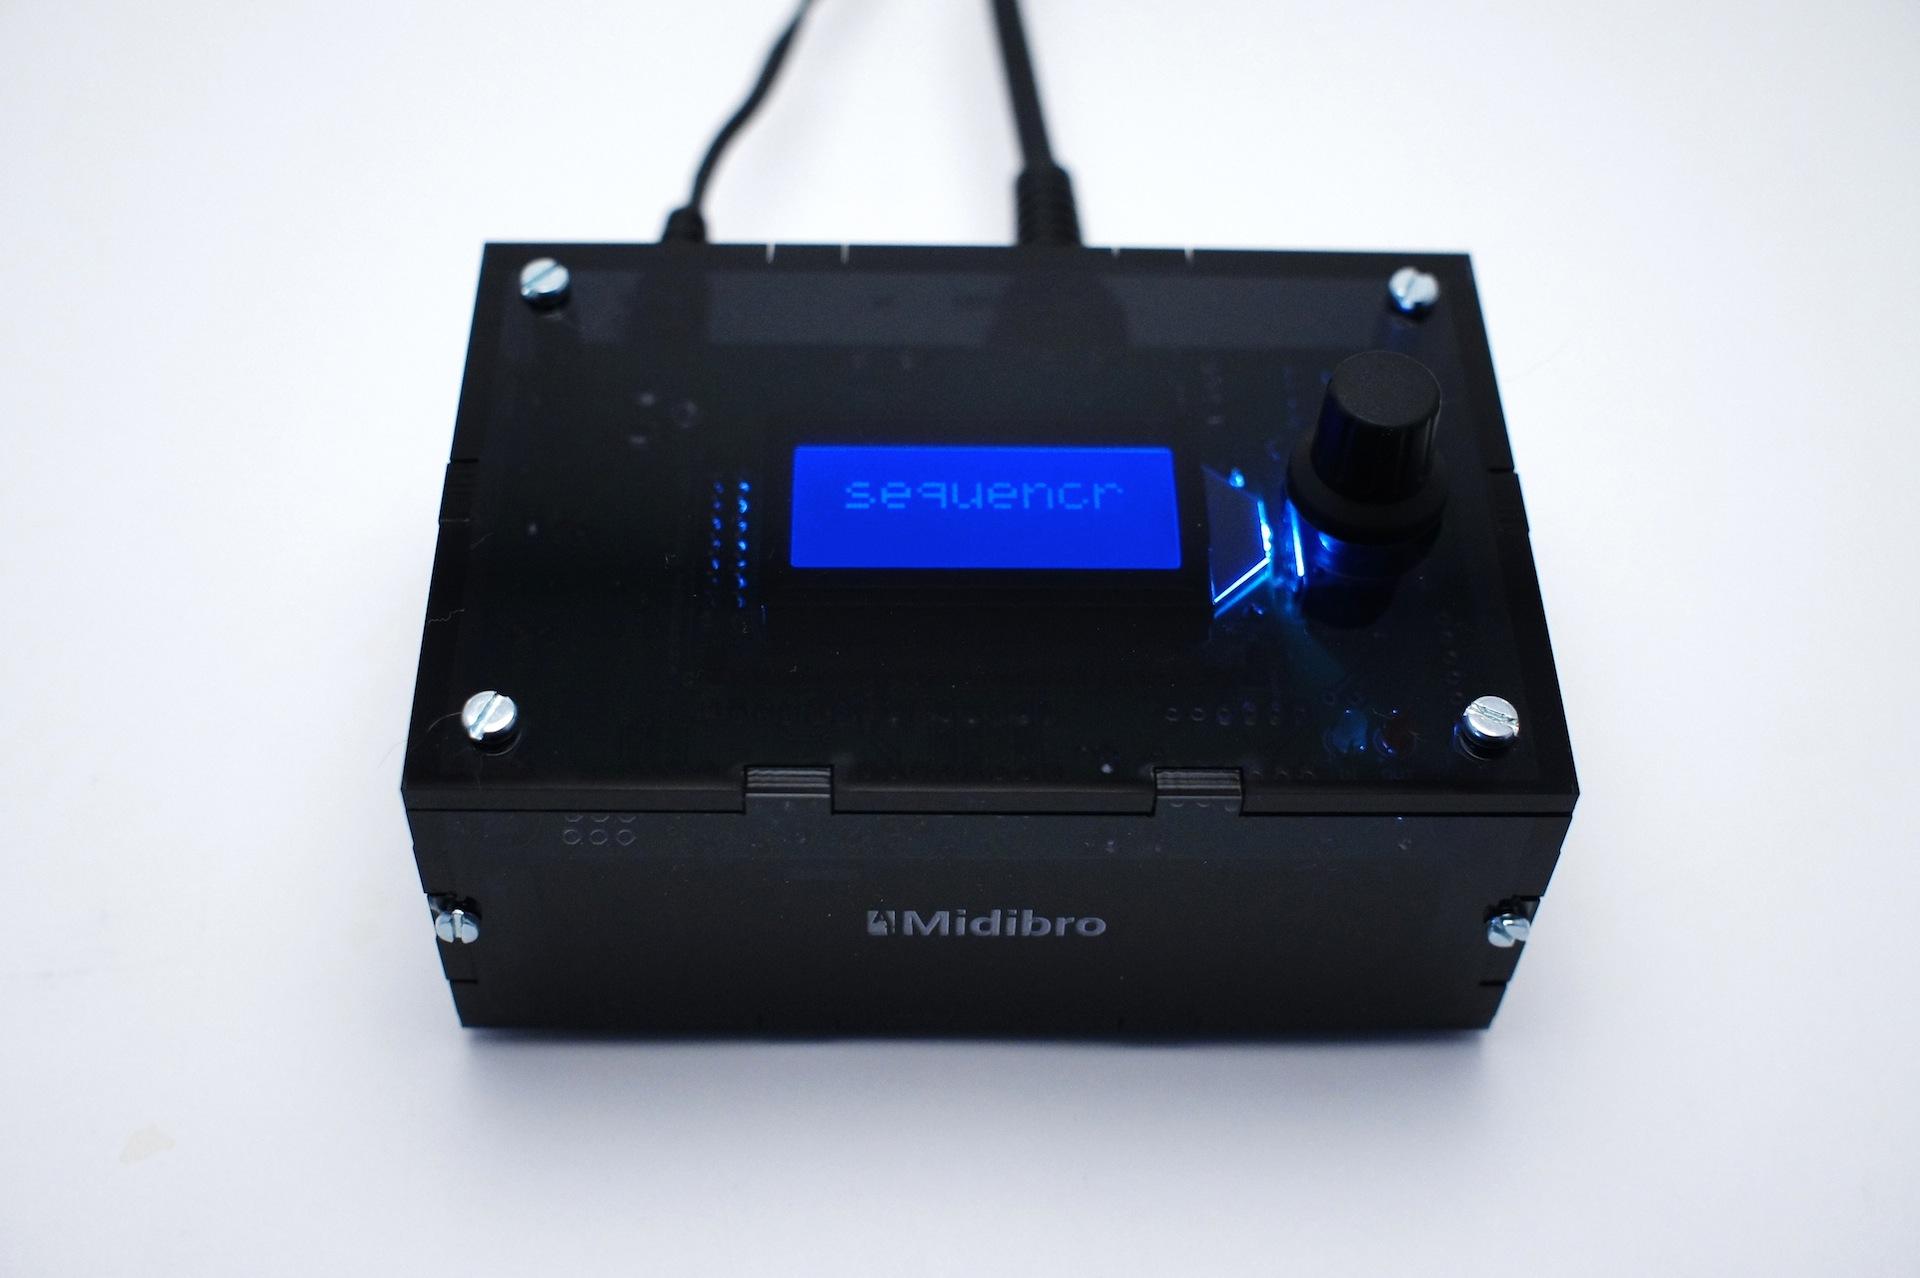 Midibro DIY kit